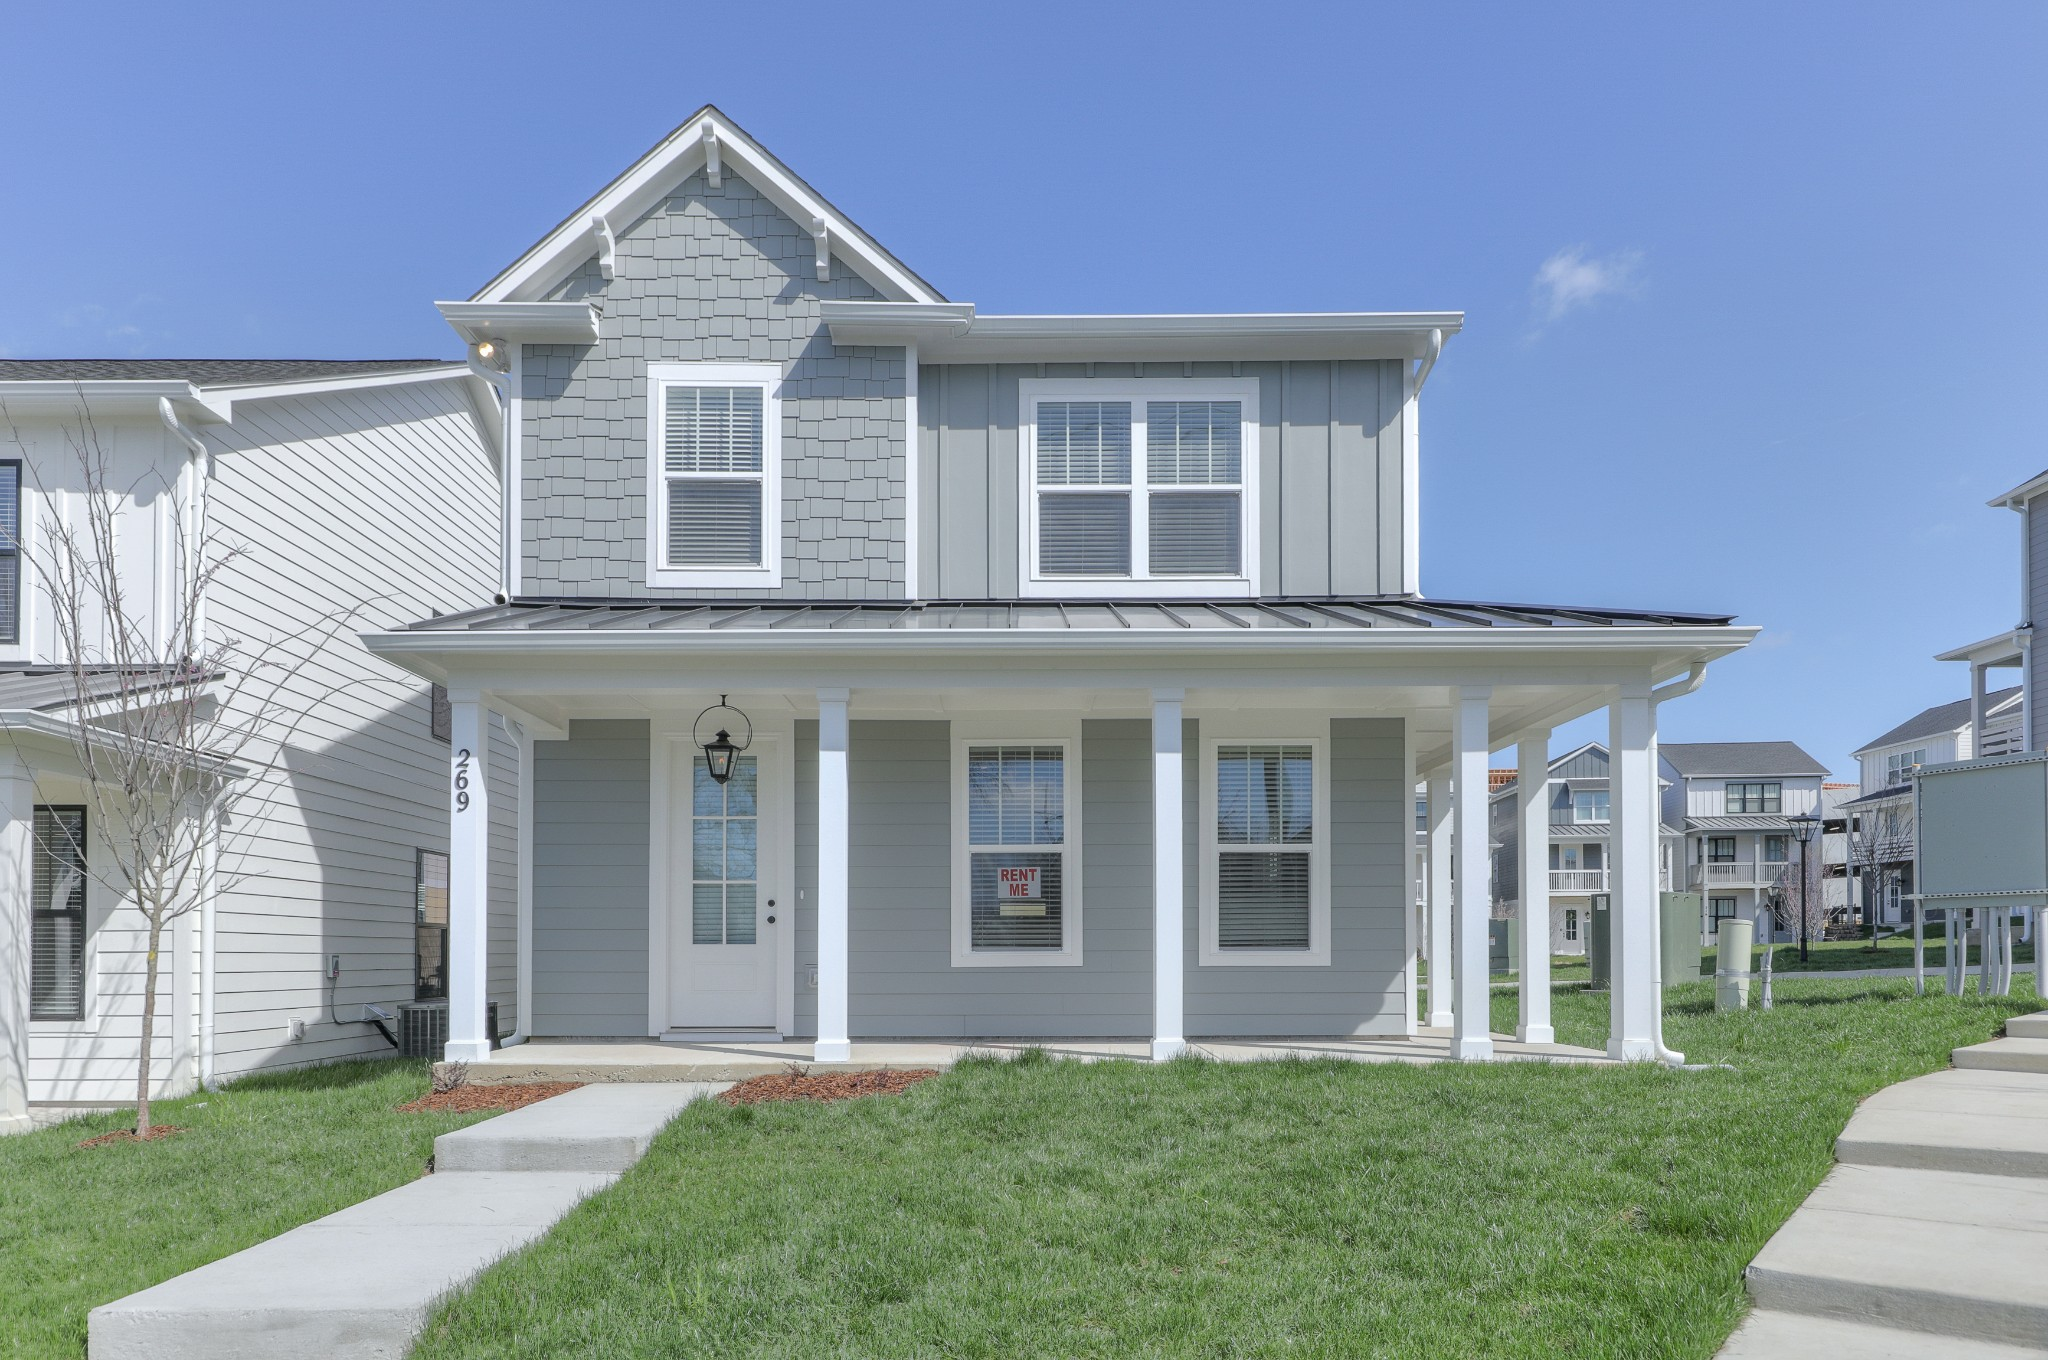 269 Founders Ln Property Photo - Nashville, TN real estate listing